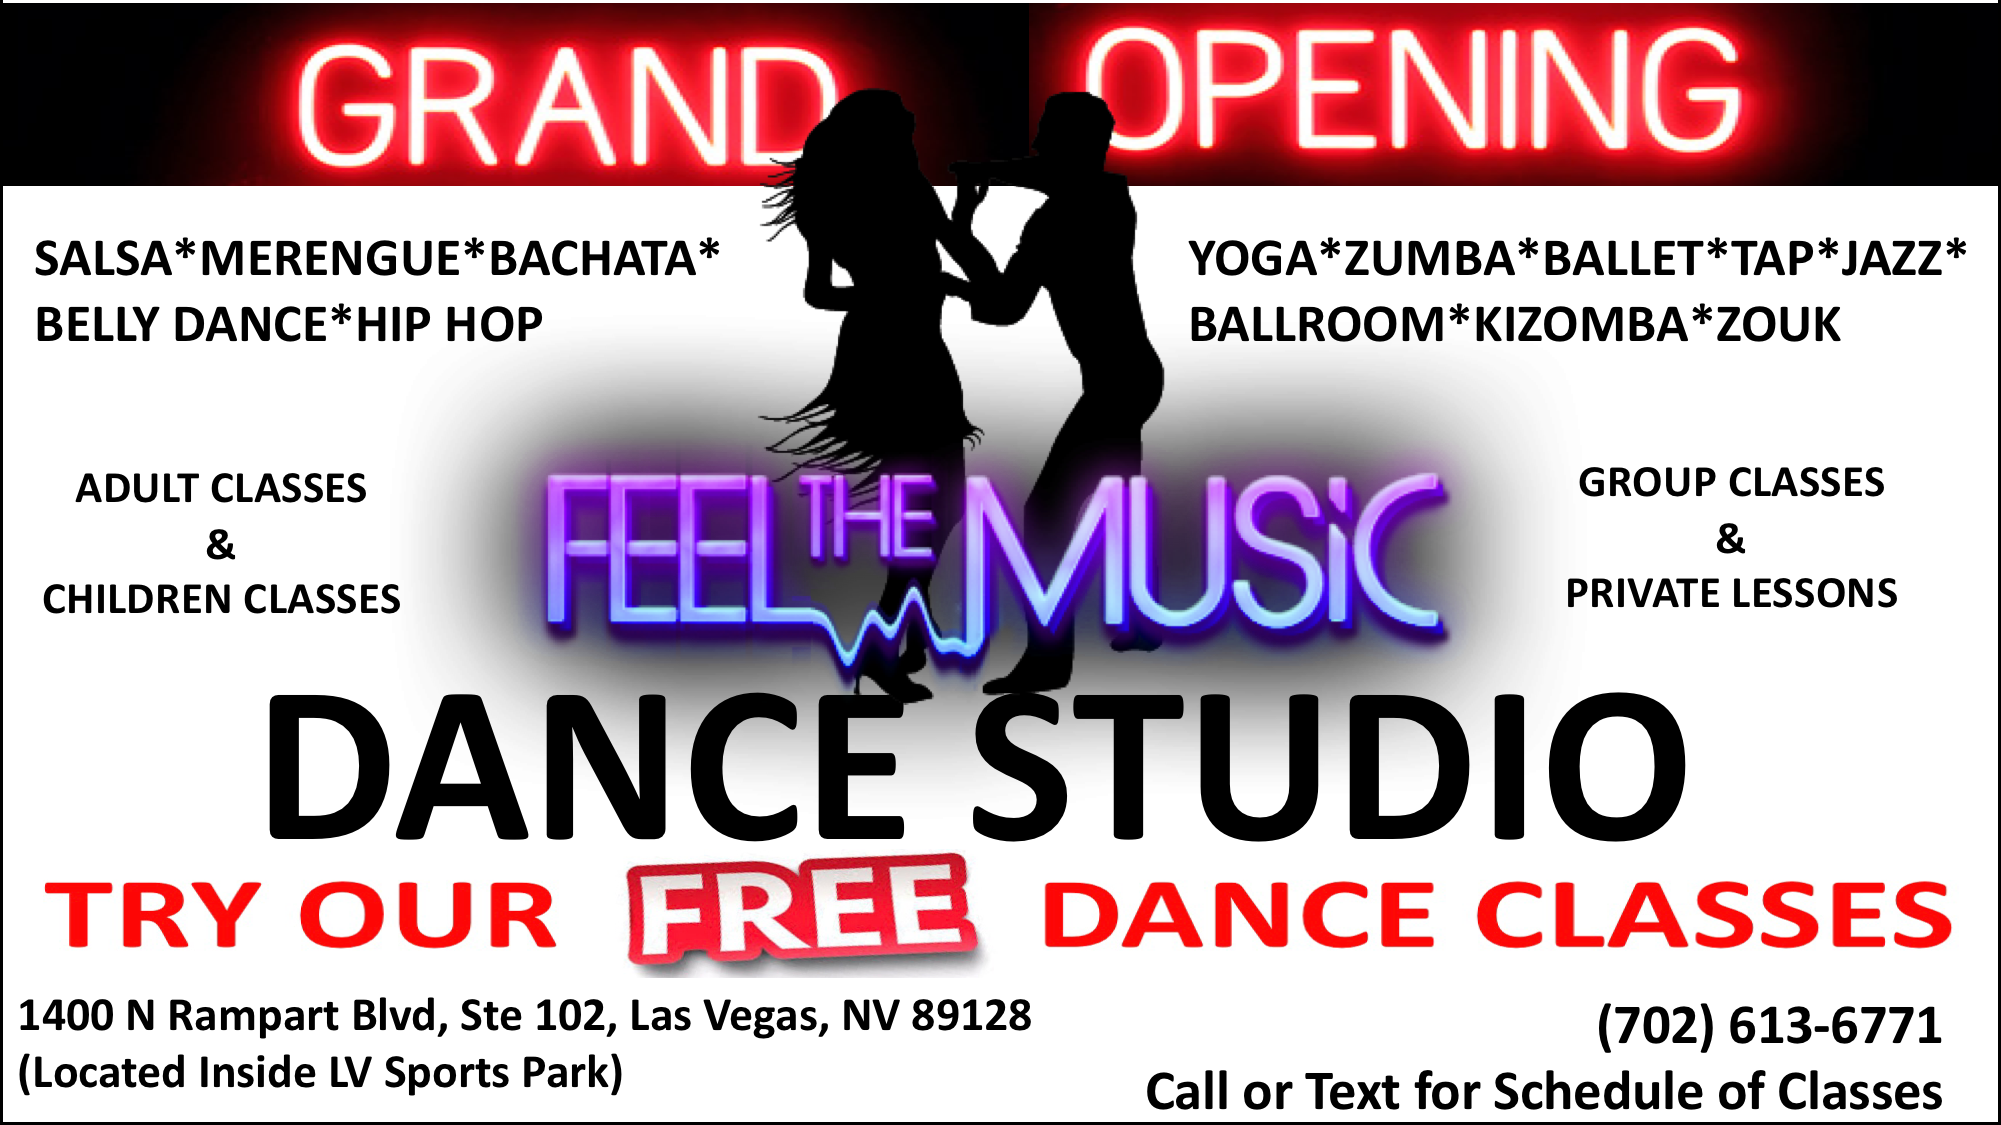 FEEL THE MUSIC DANCE STUDIO